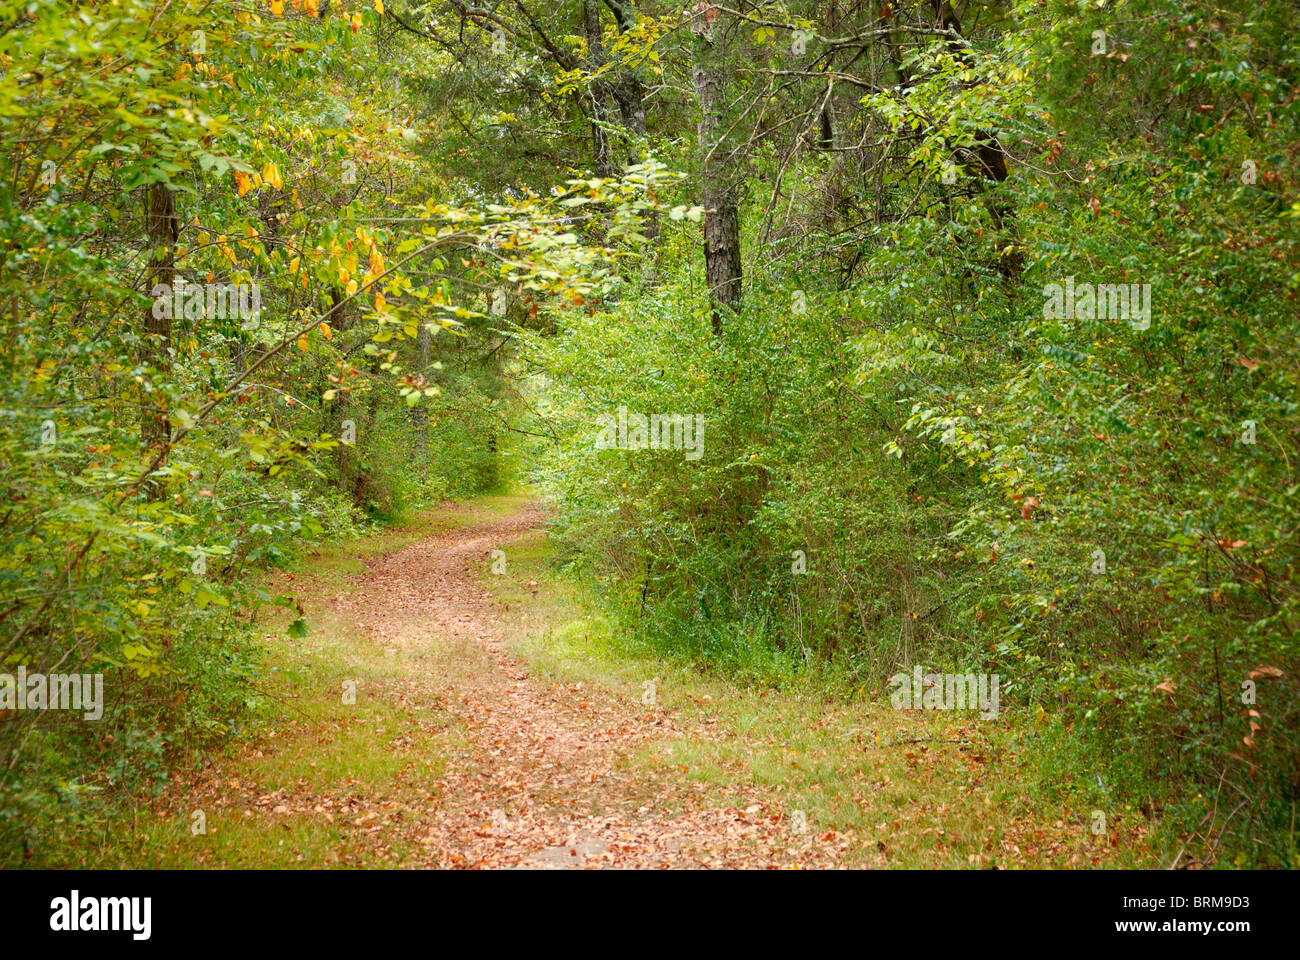 Hiking trail, Chickamauga Battlefield, Georgia, USA - Stock Image